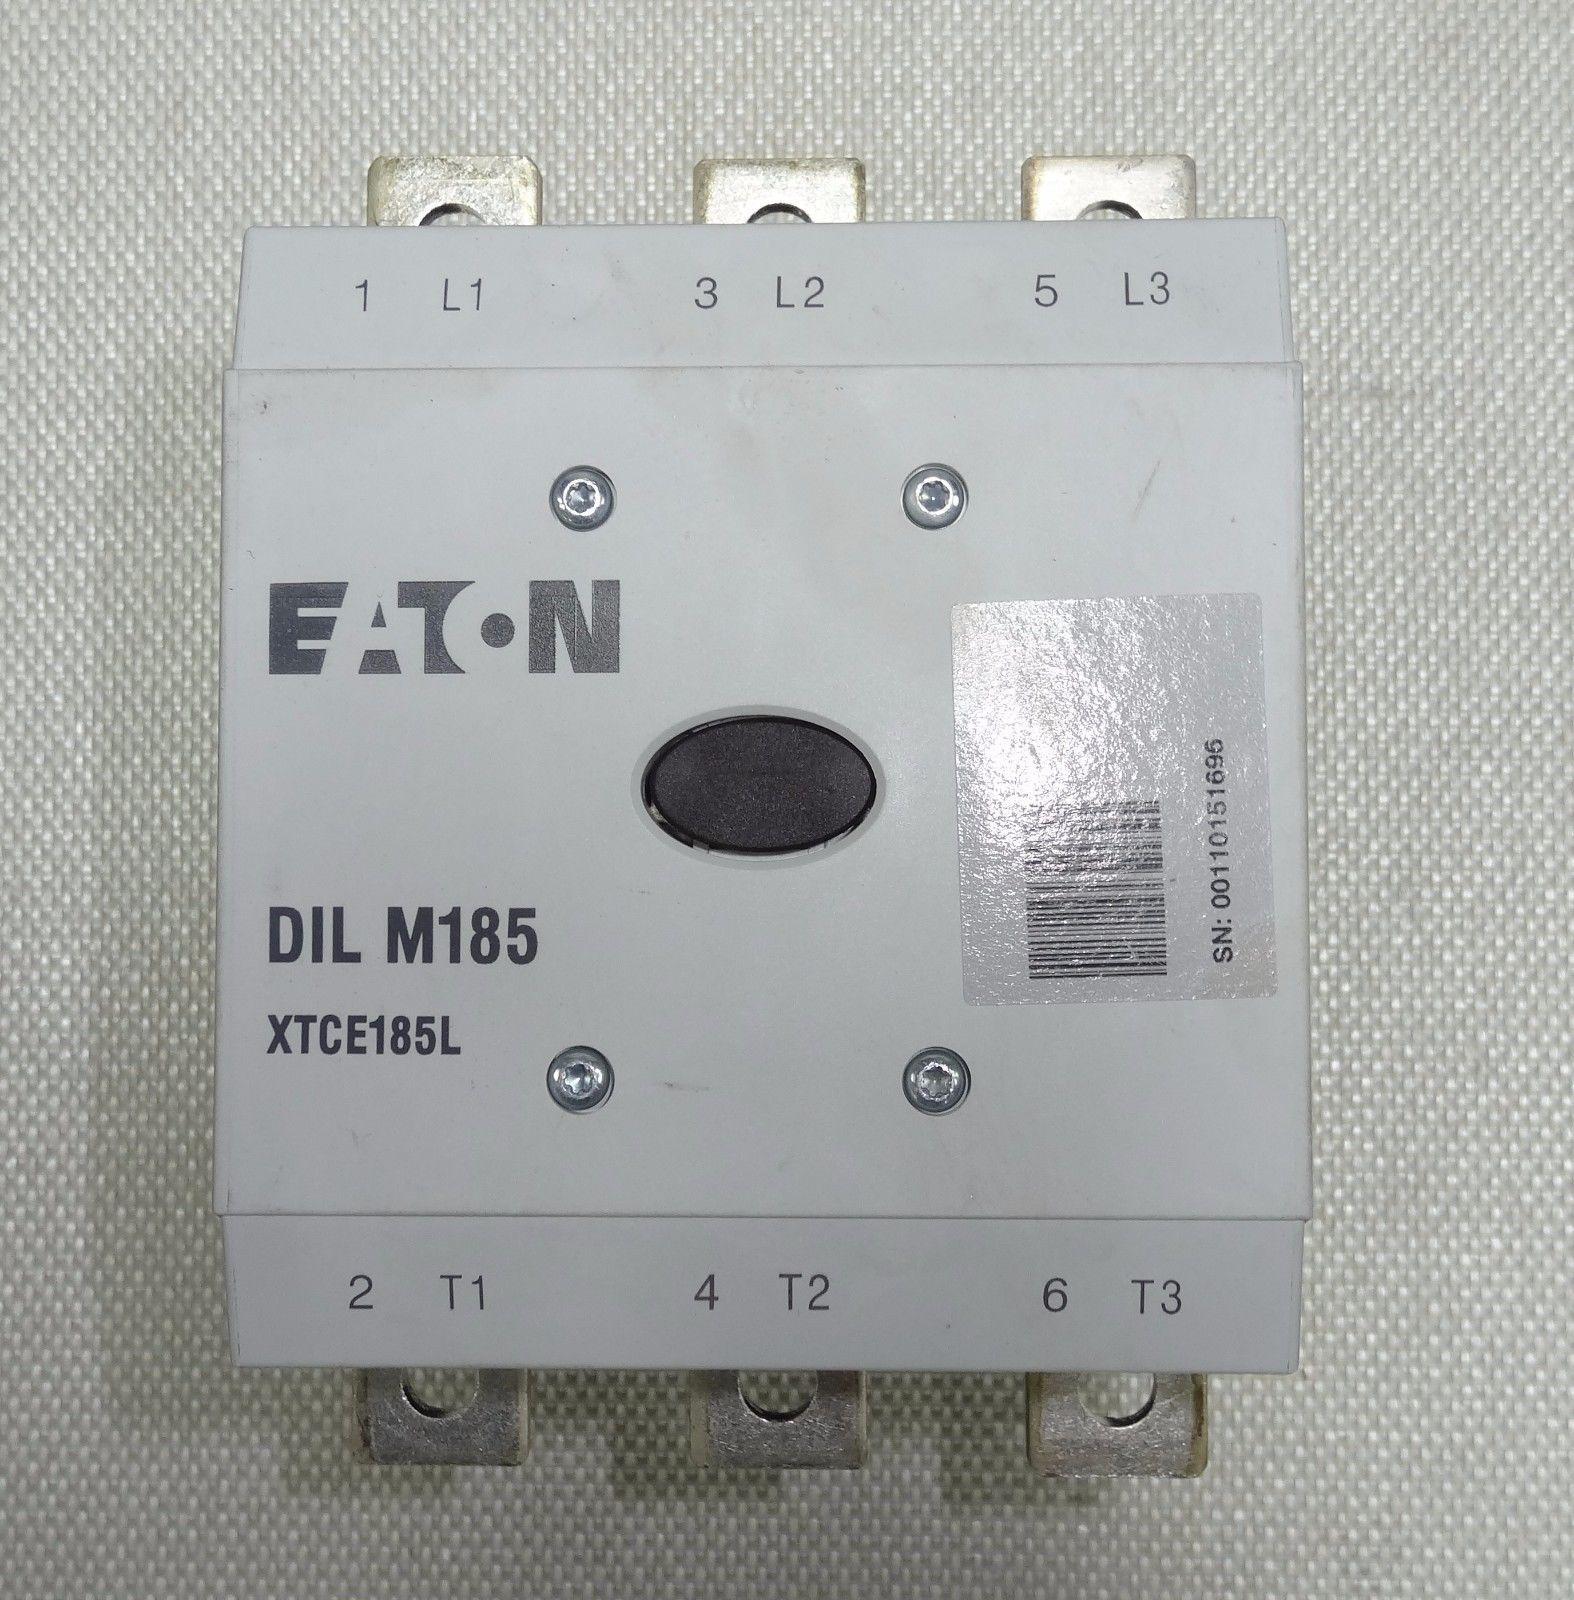 MC6862L ULTRA RARA Motorola IC DC75 Viola in Ceramica Oro Top e gambe MC6862P